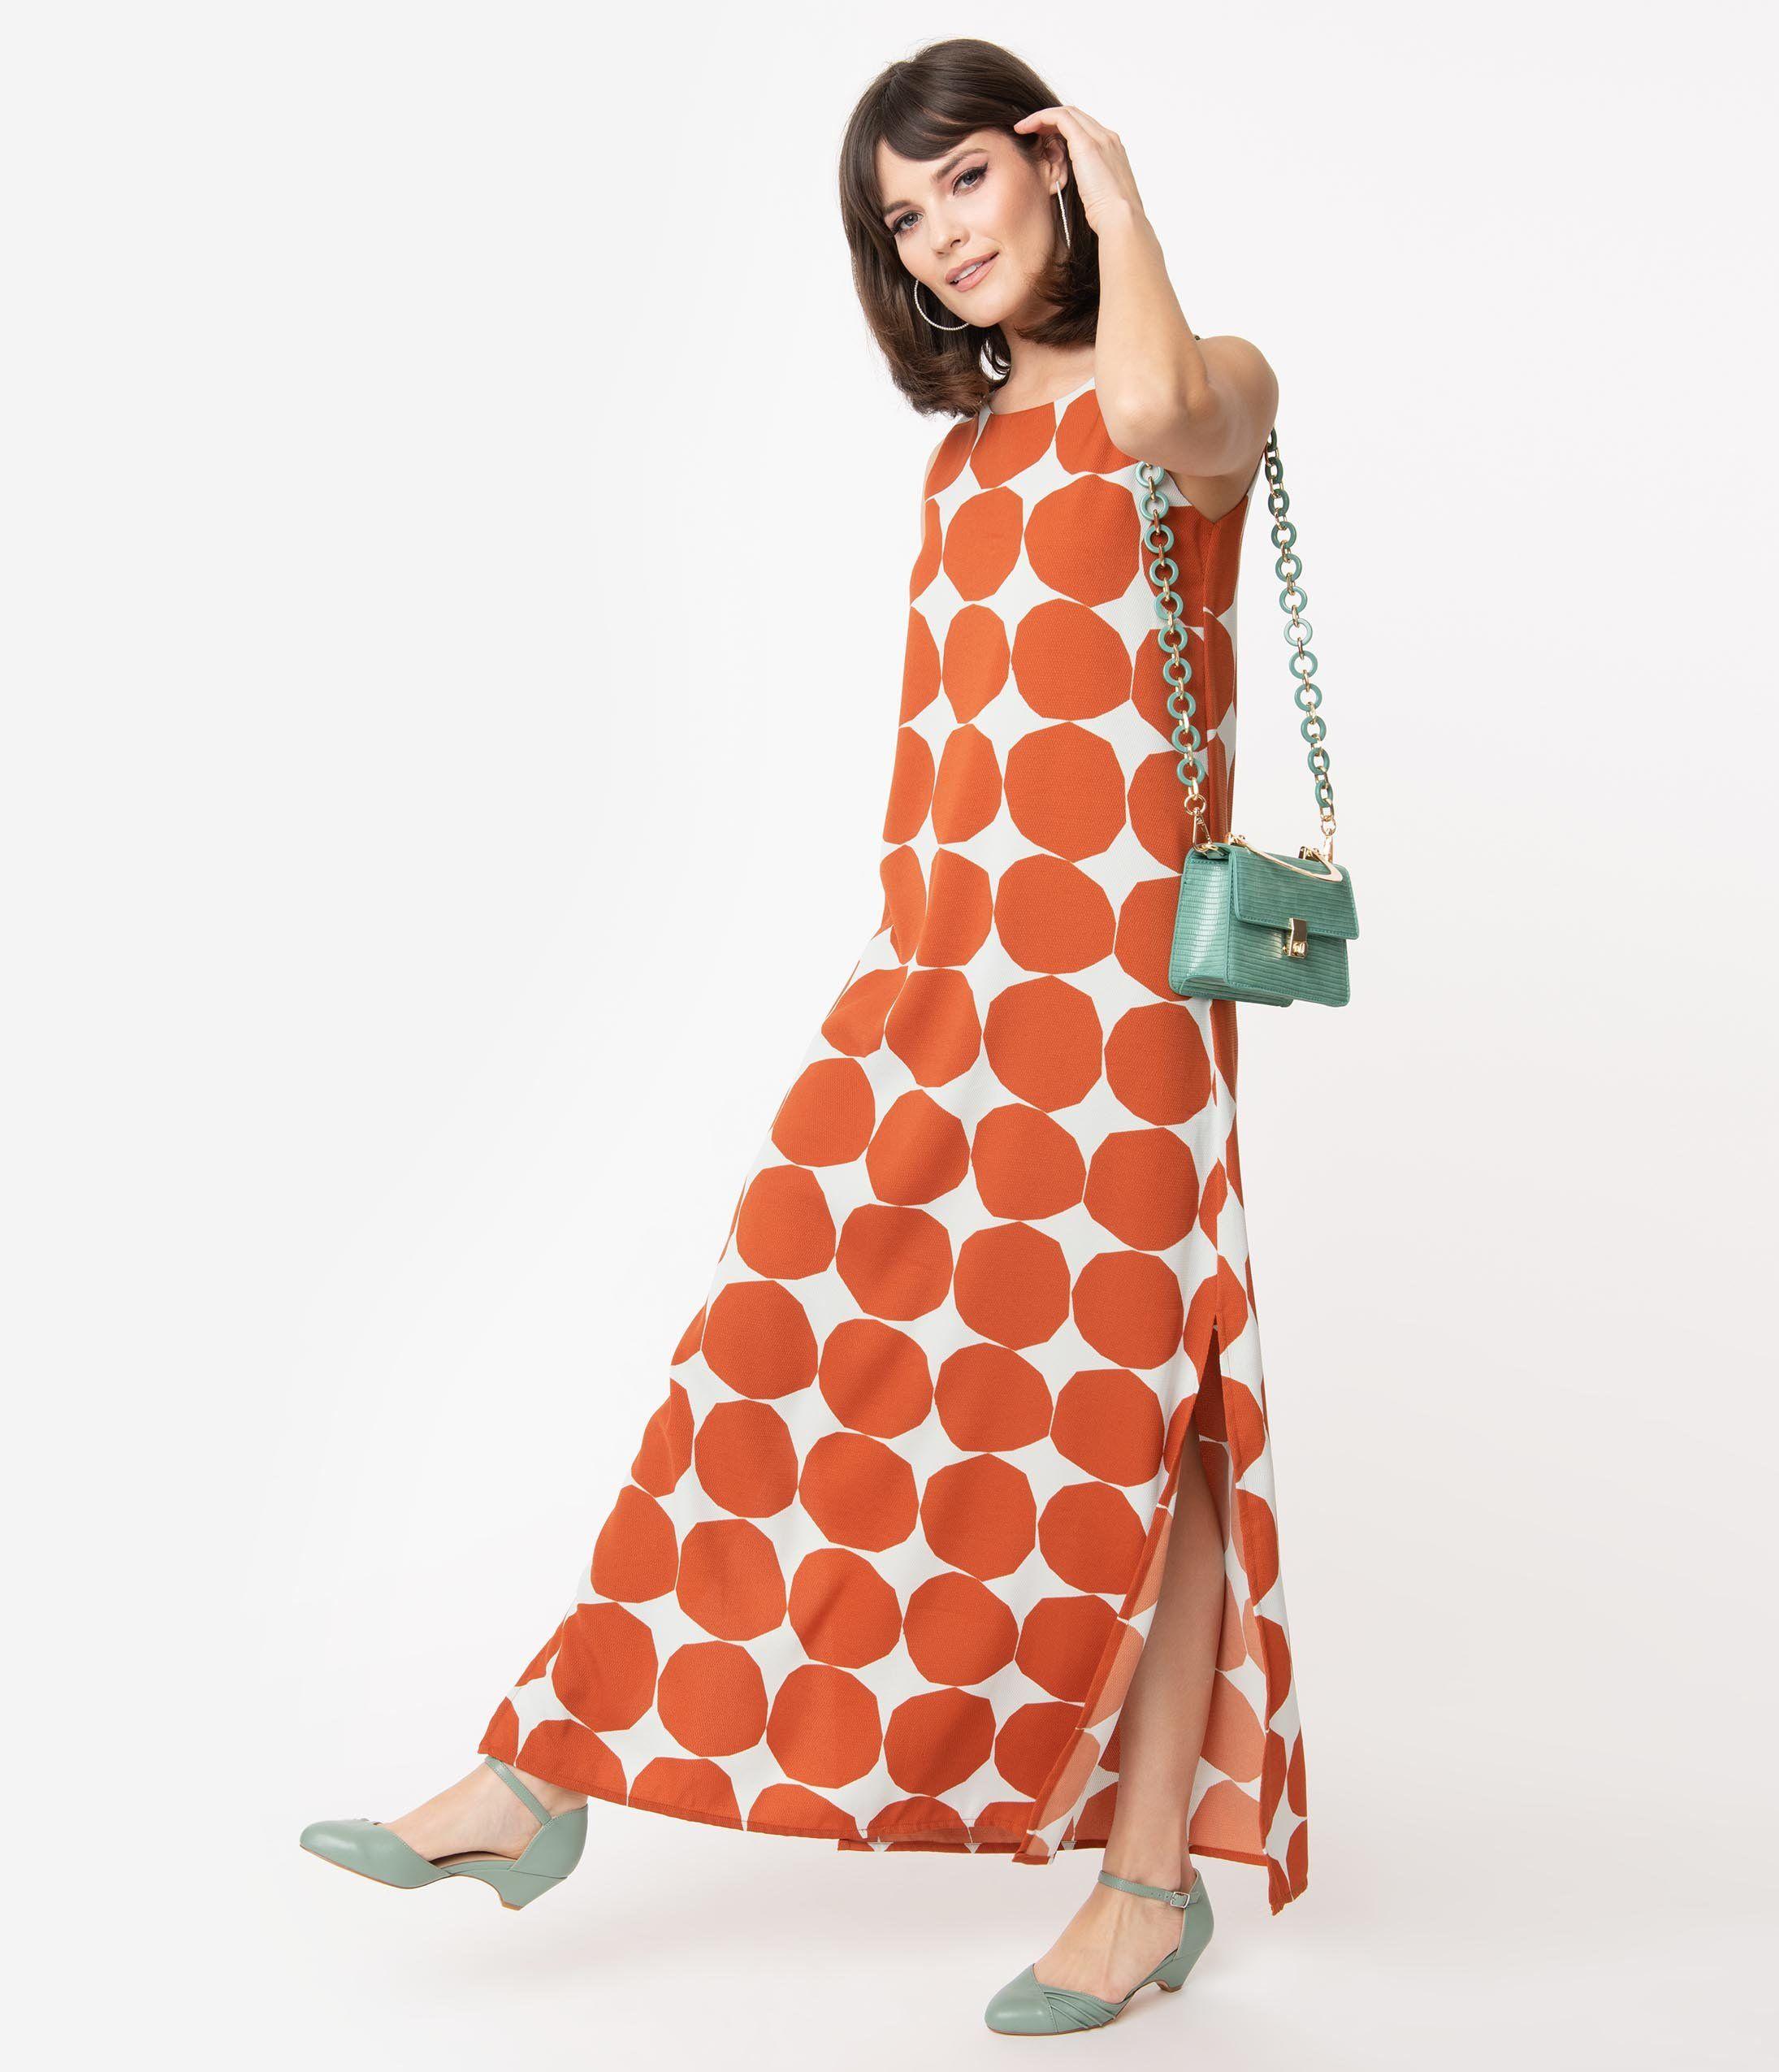 50 Vintage Inspired Clothing Brands Stores Shops Online In 2020 Printed Maxi Dress Vintage Inspired Outfits Vintage Inspired Dresses